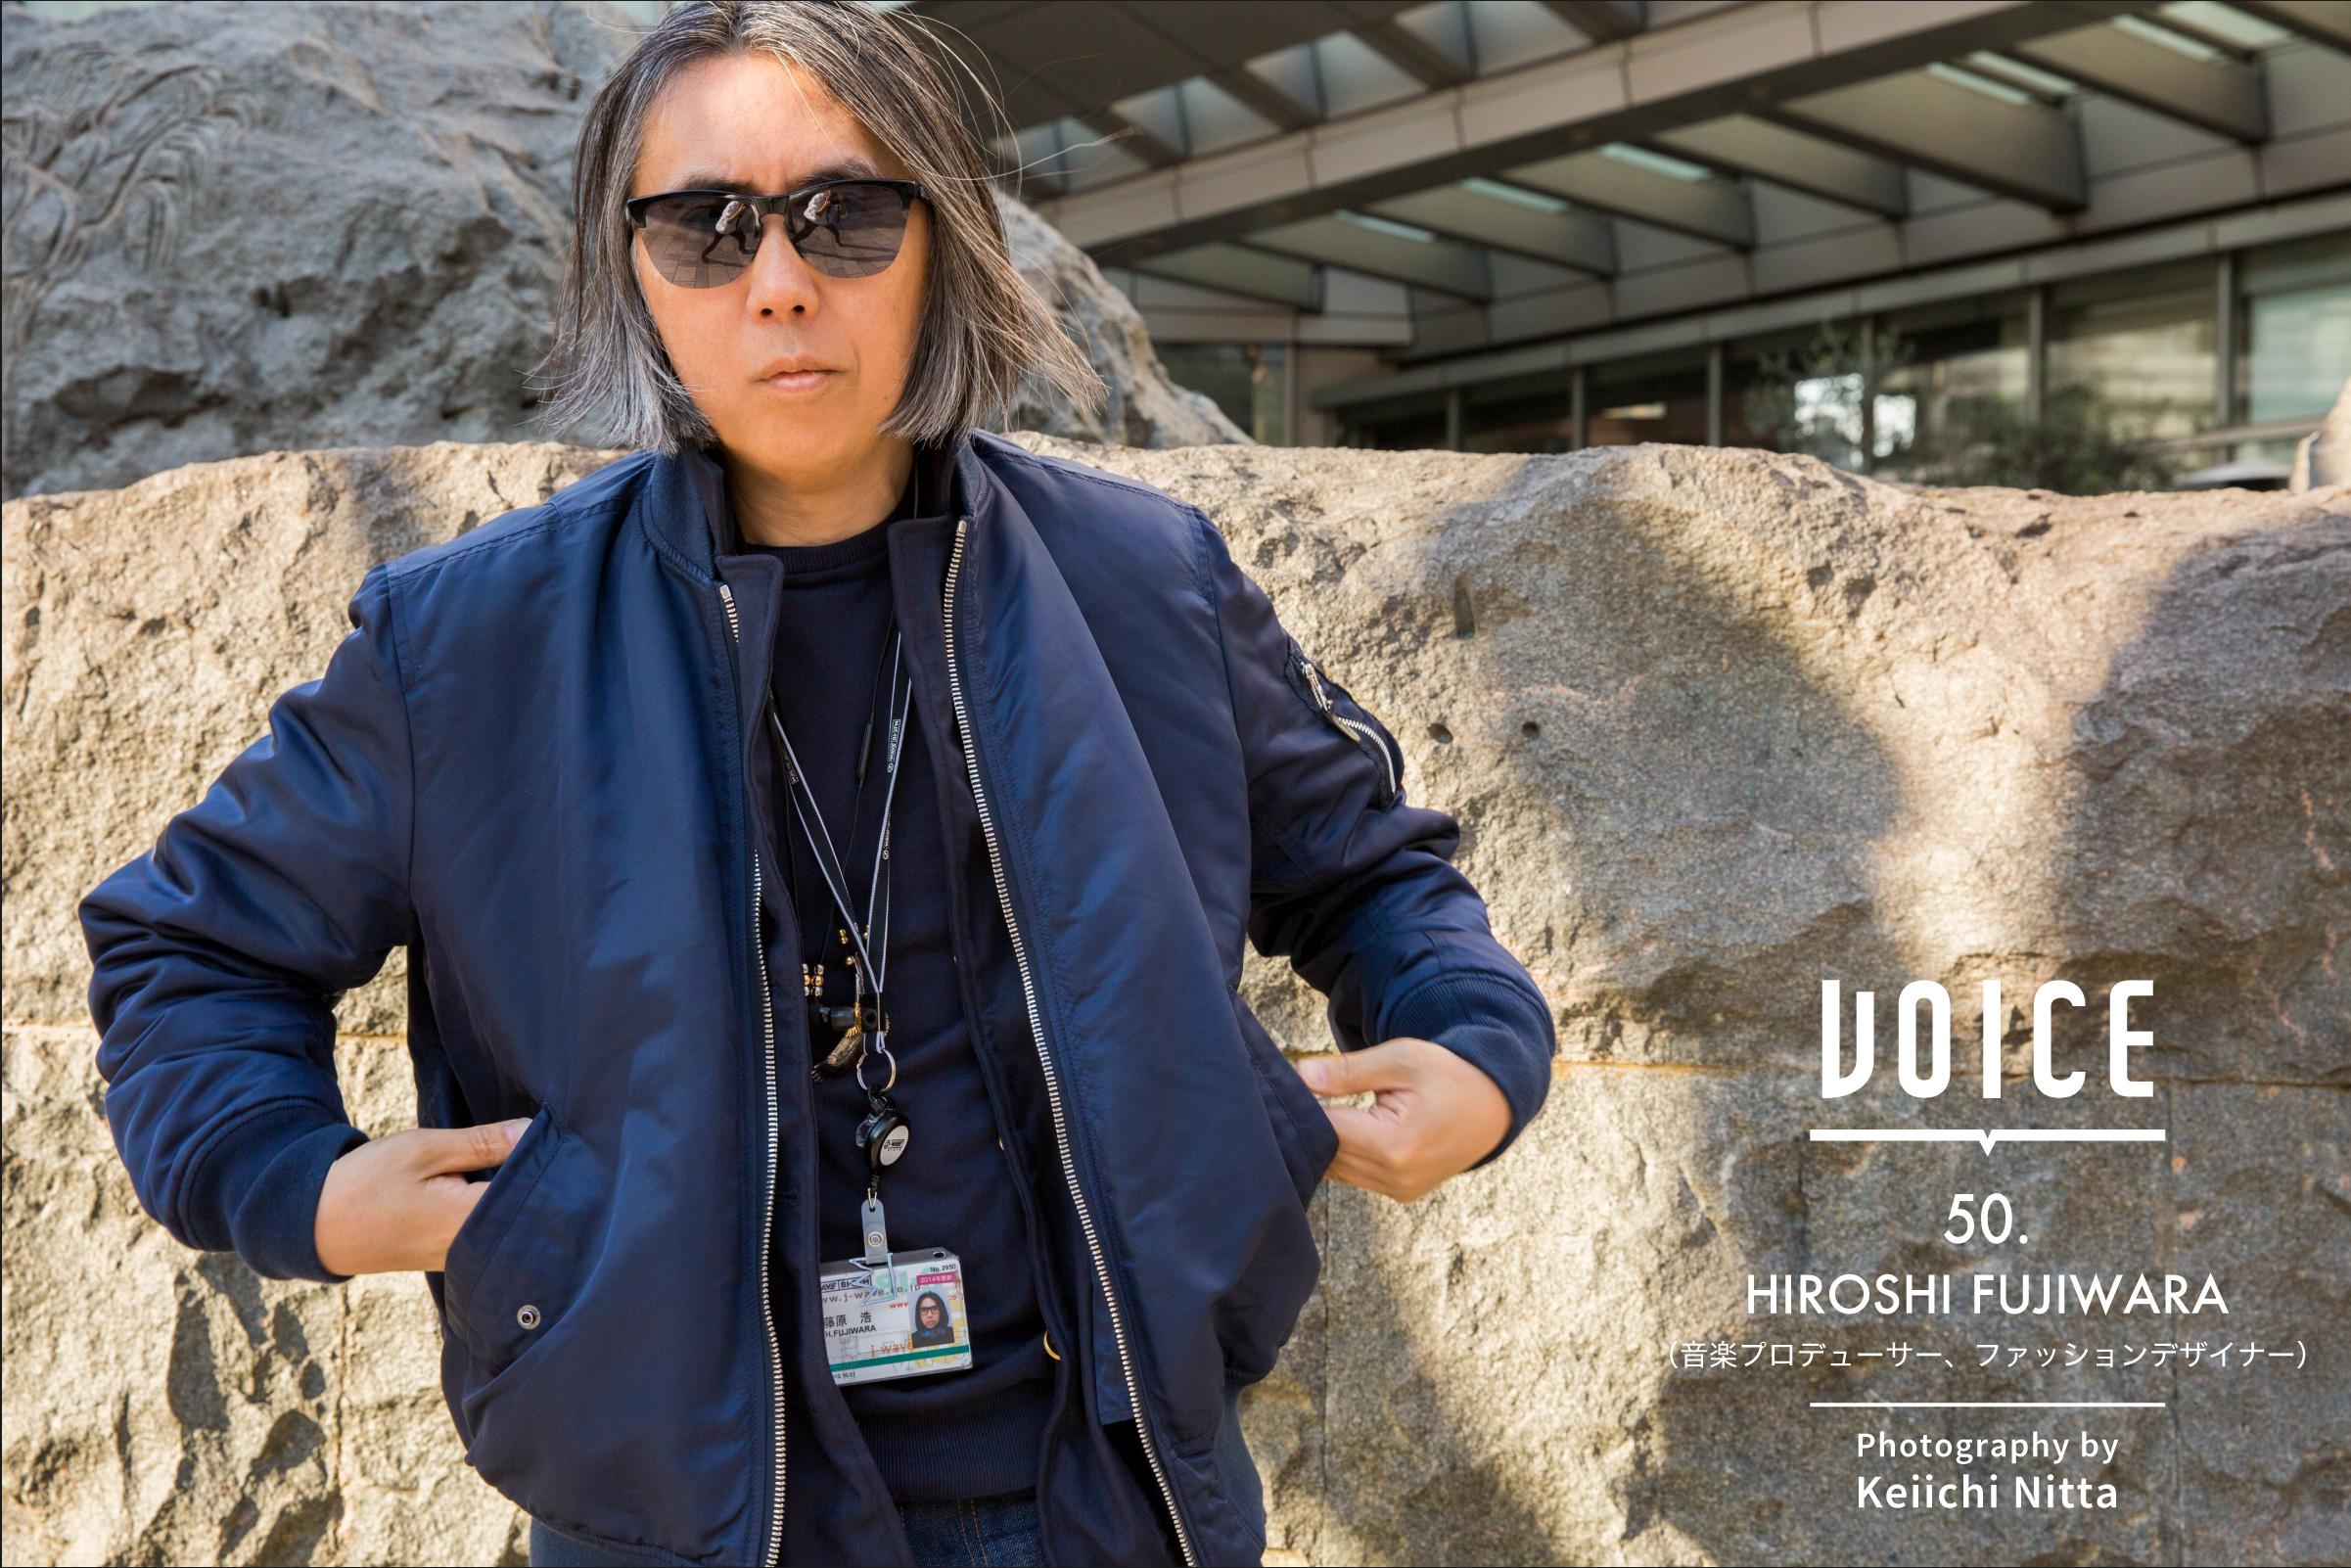 VOICE.50 「いつの時代も、アナログなコミュニケーションは変わらない」HIROSHI FUJIWARA(音楽プロデューサー、ファッションデザイナー) | Photography by Keiichi Nitta